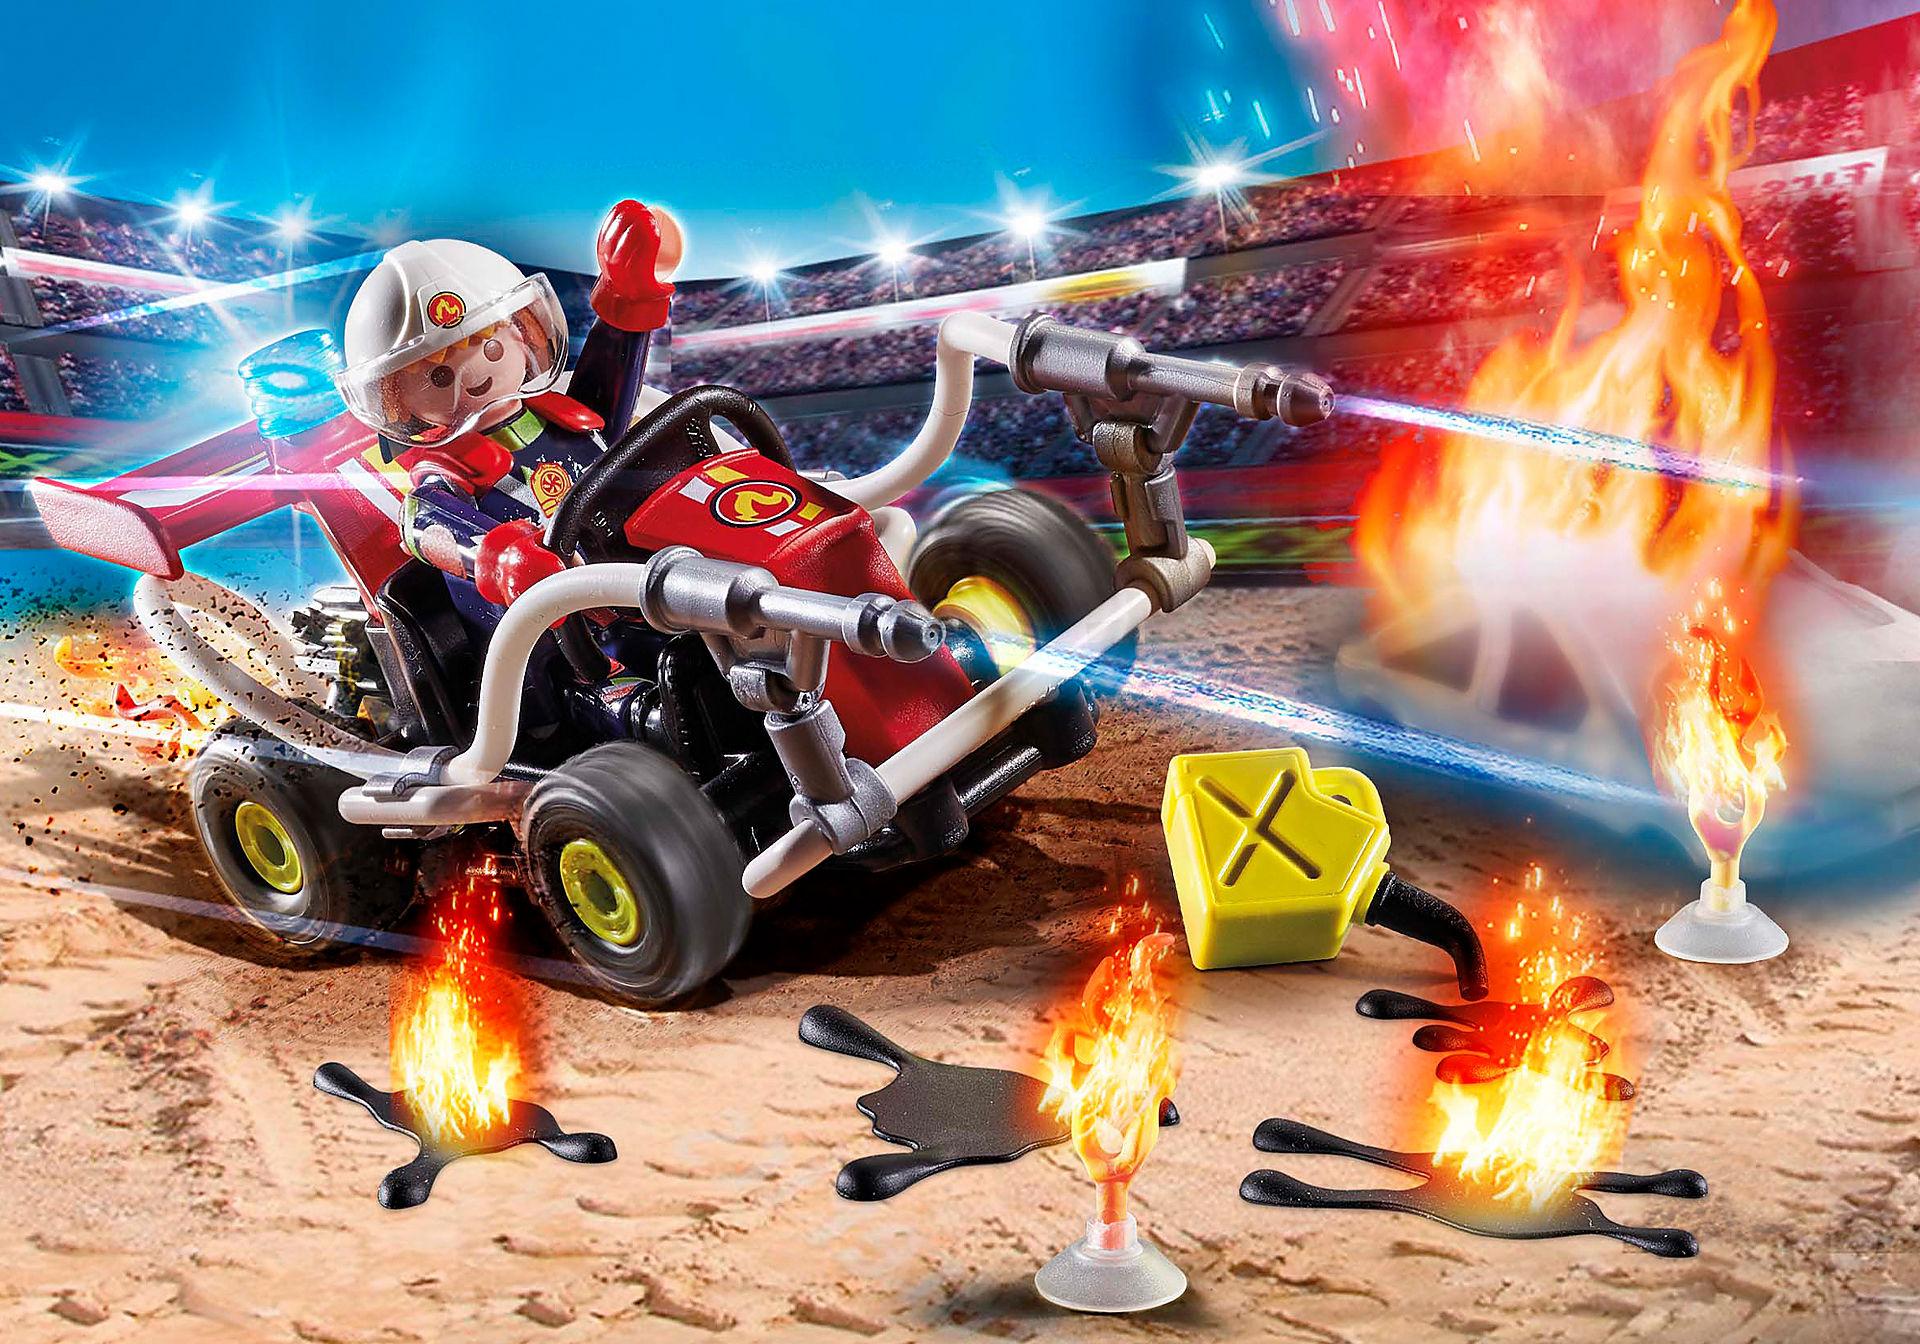 70554 Stunt Show Fire Quad zoom image1